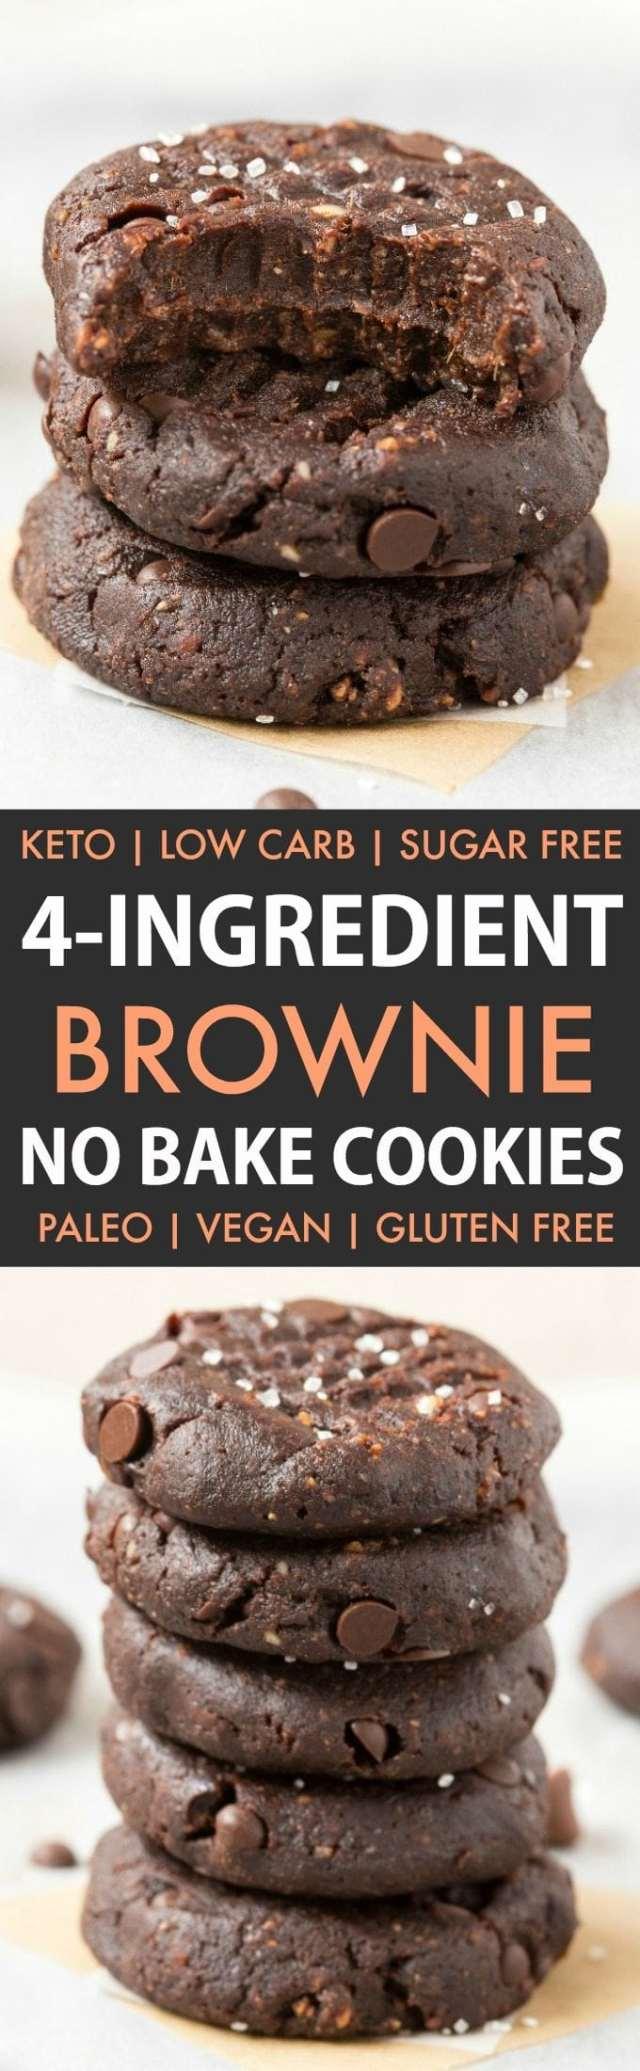 4-Ingredient No Bake Brownie Cookies in a collage